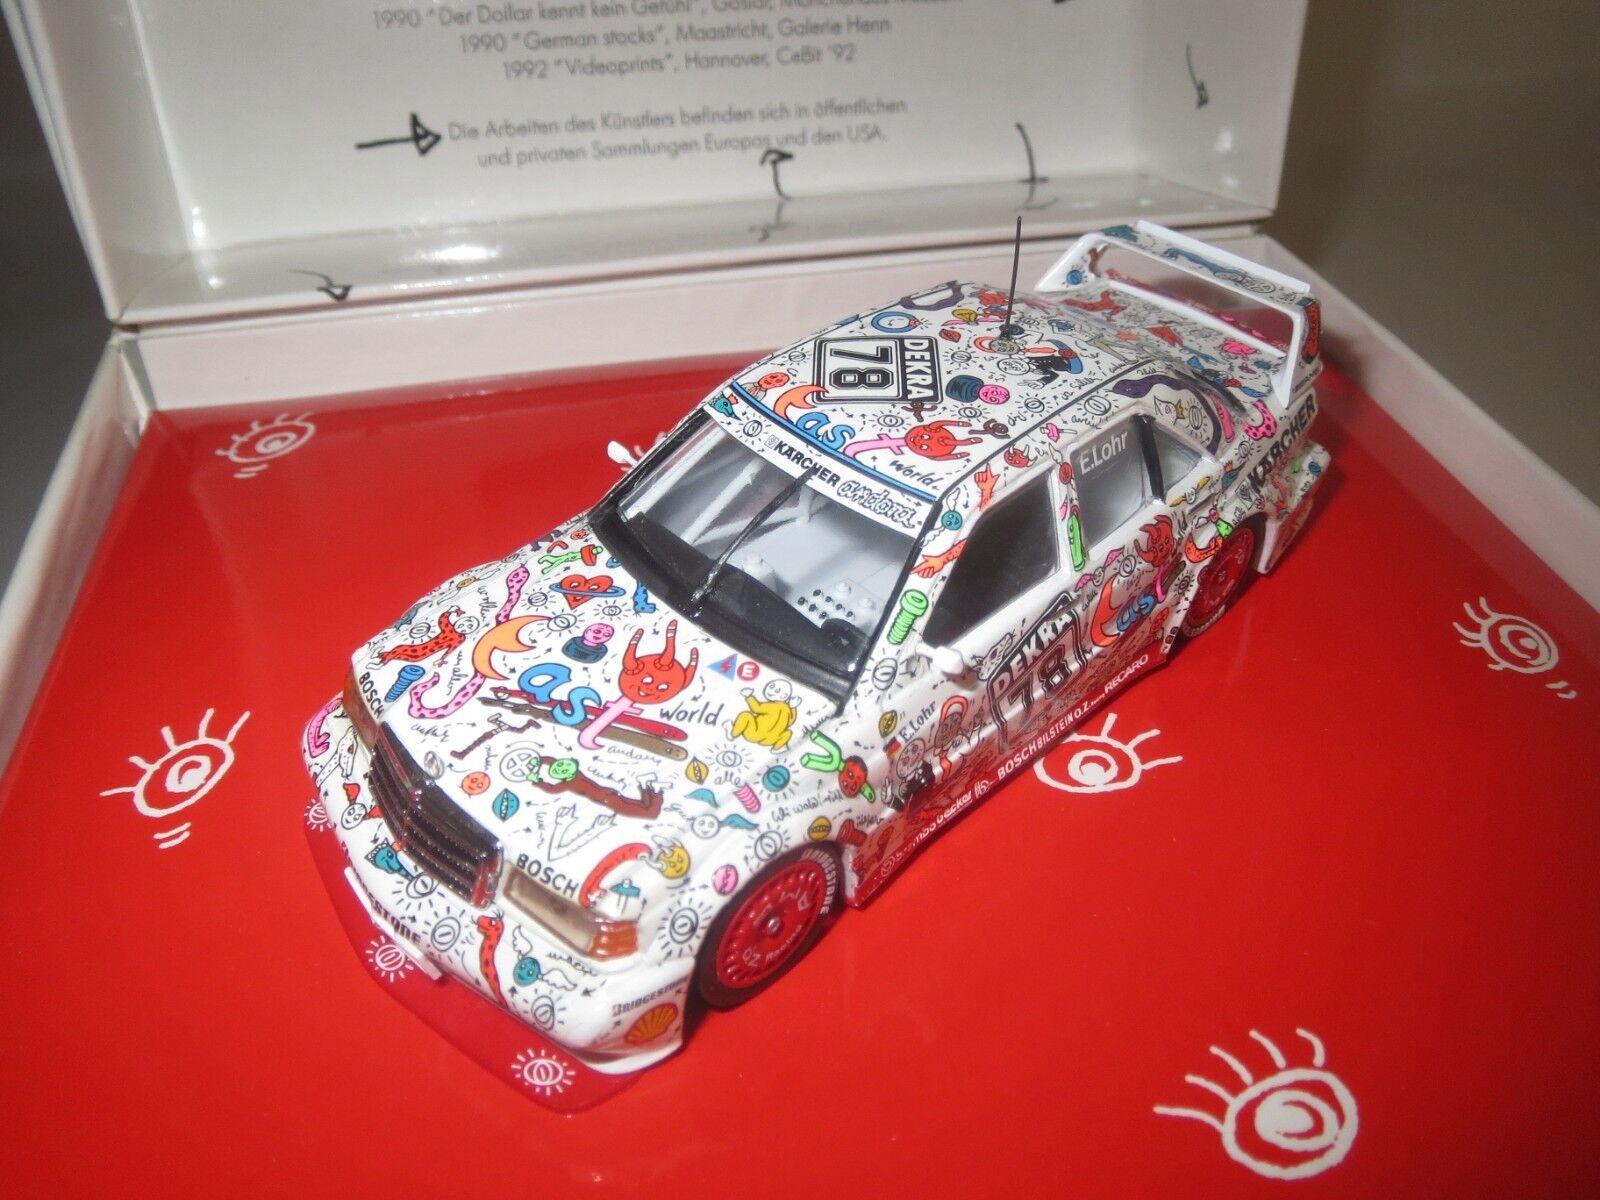 Minichamps tipo car Edition Mercedes-Benz 190 e camionista: E. LOHR 1:43 OVP